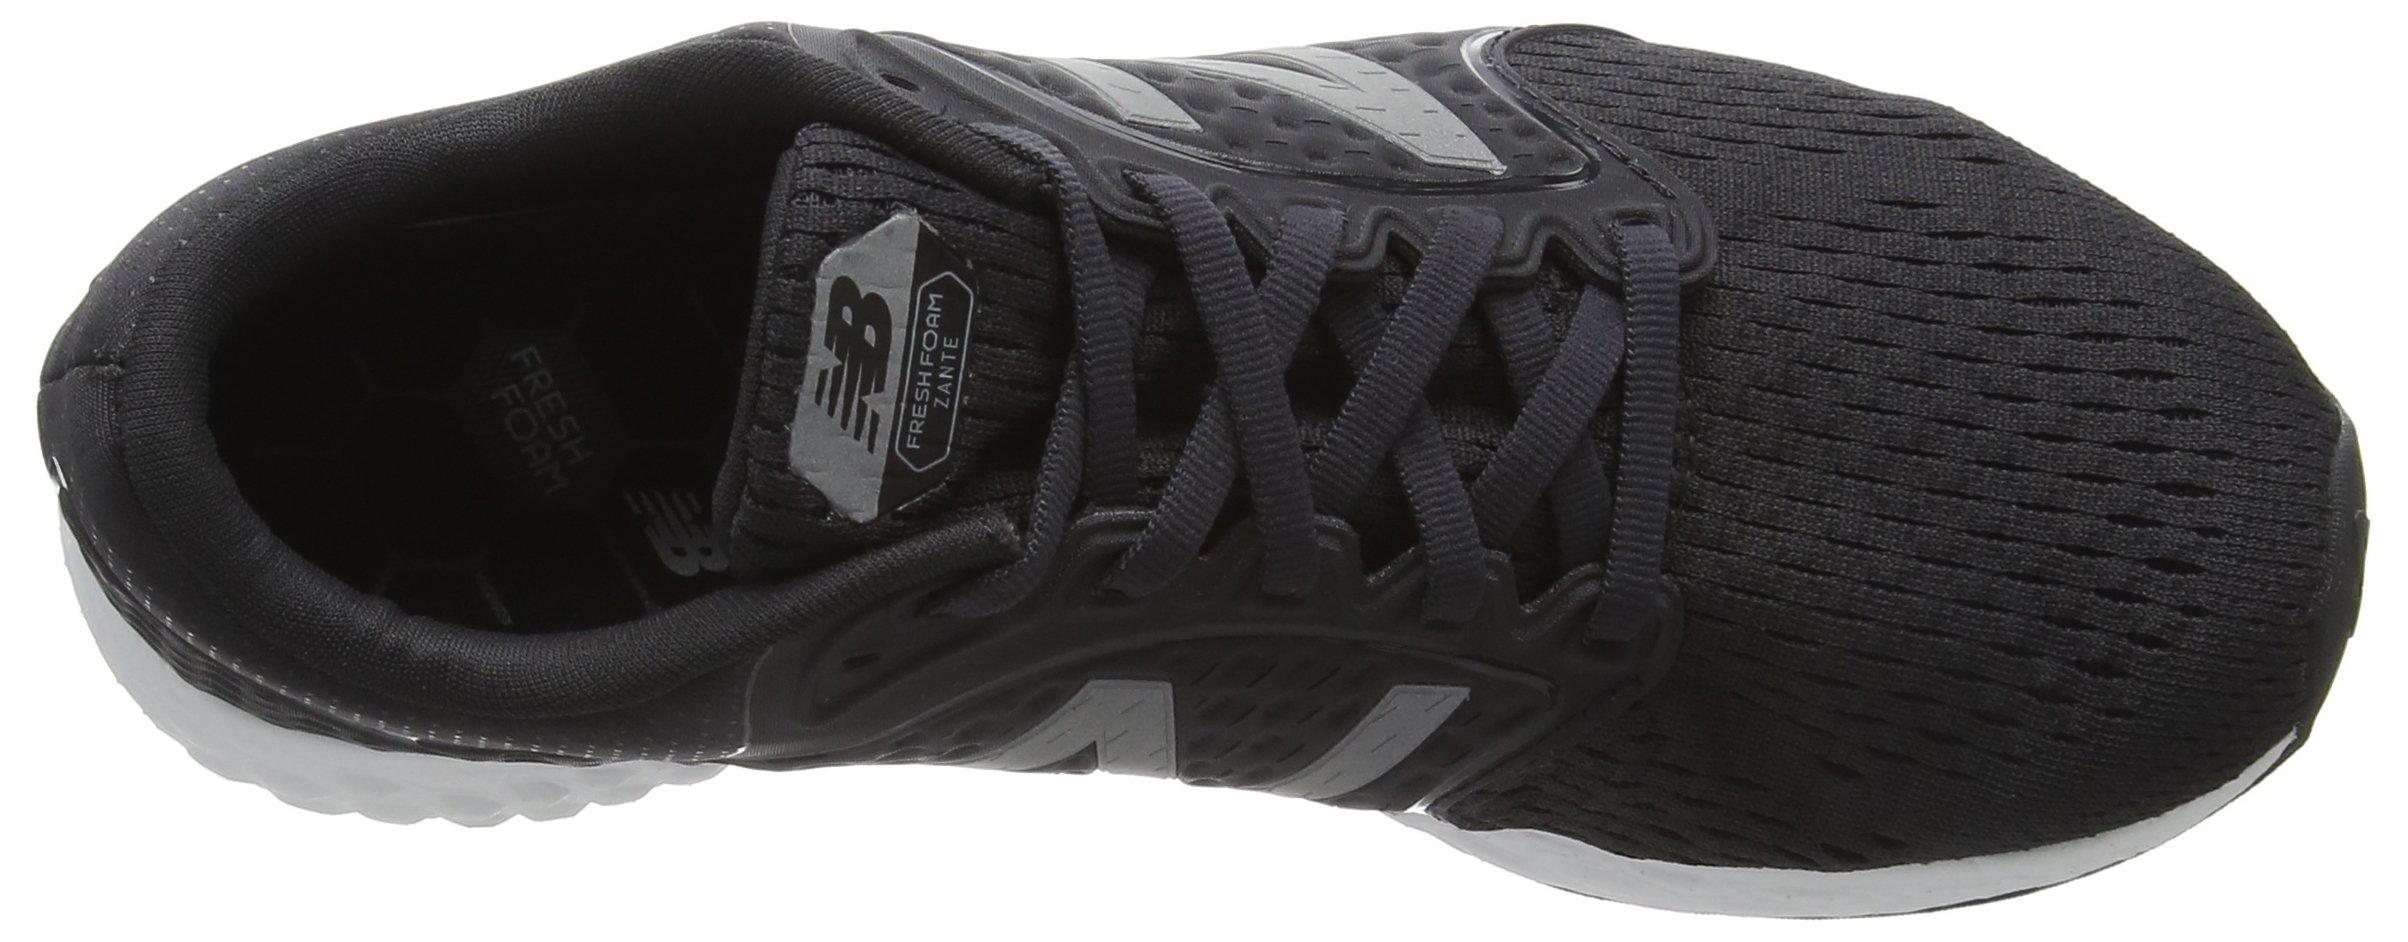 71eK9HUxuvL - New Balance Women's Fresh Foam Zante V4 Neutral Running Shoes